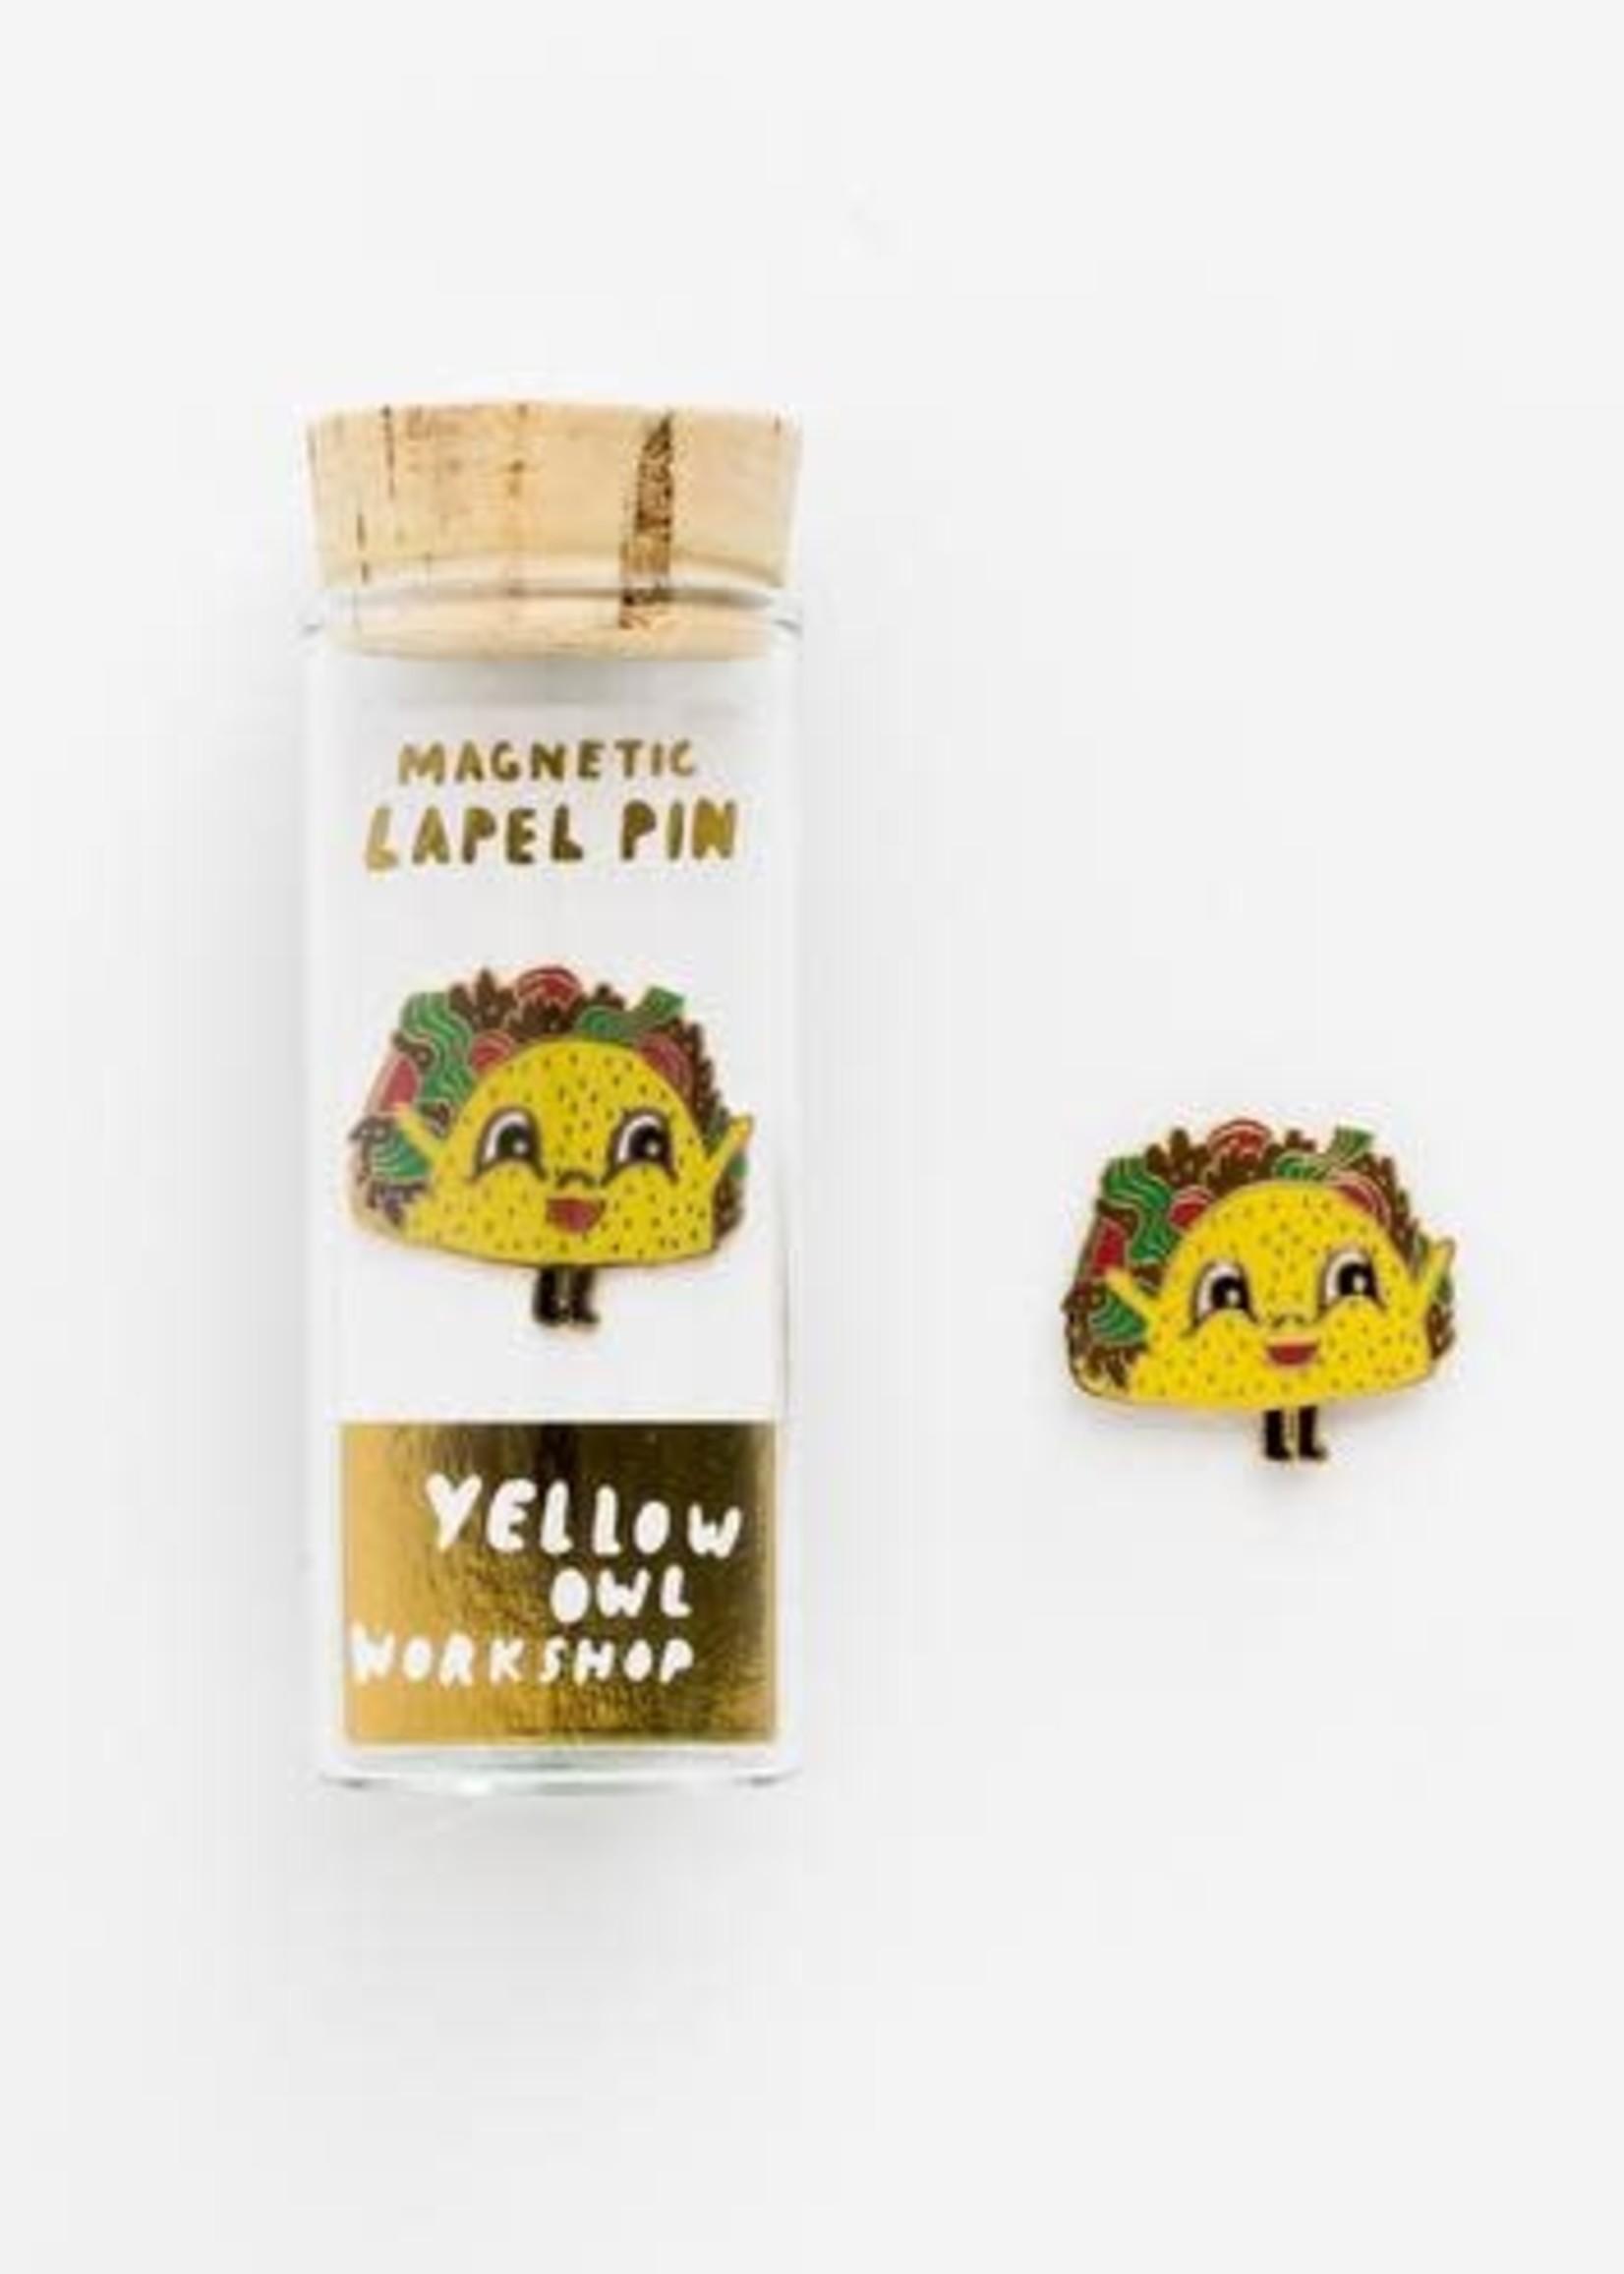 YELLOW OWL WORKSHOP YELLOW OWL TACO PIN